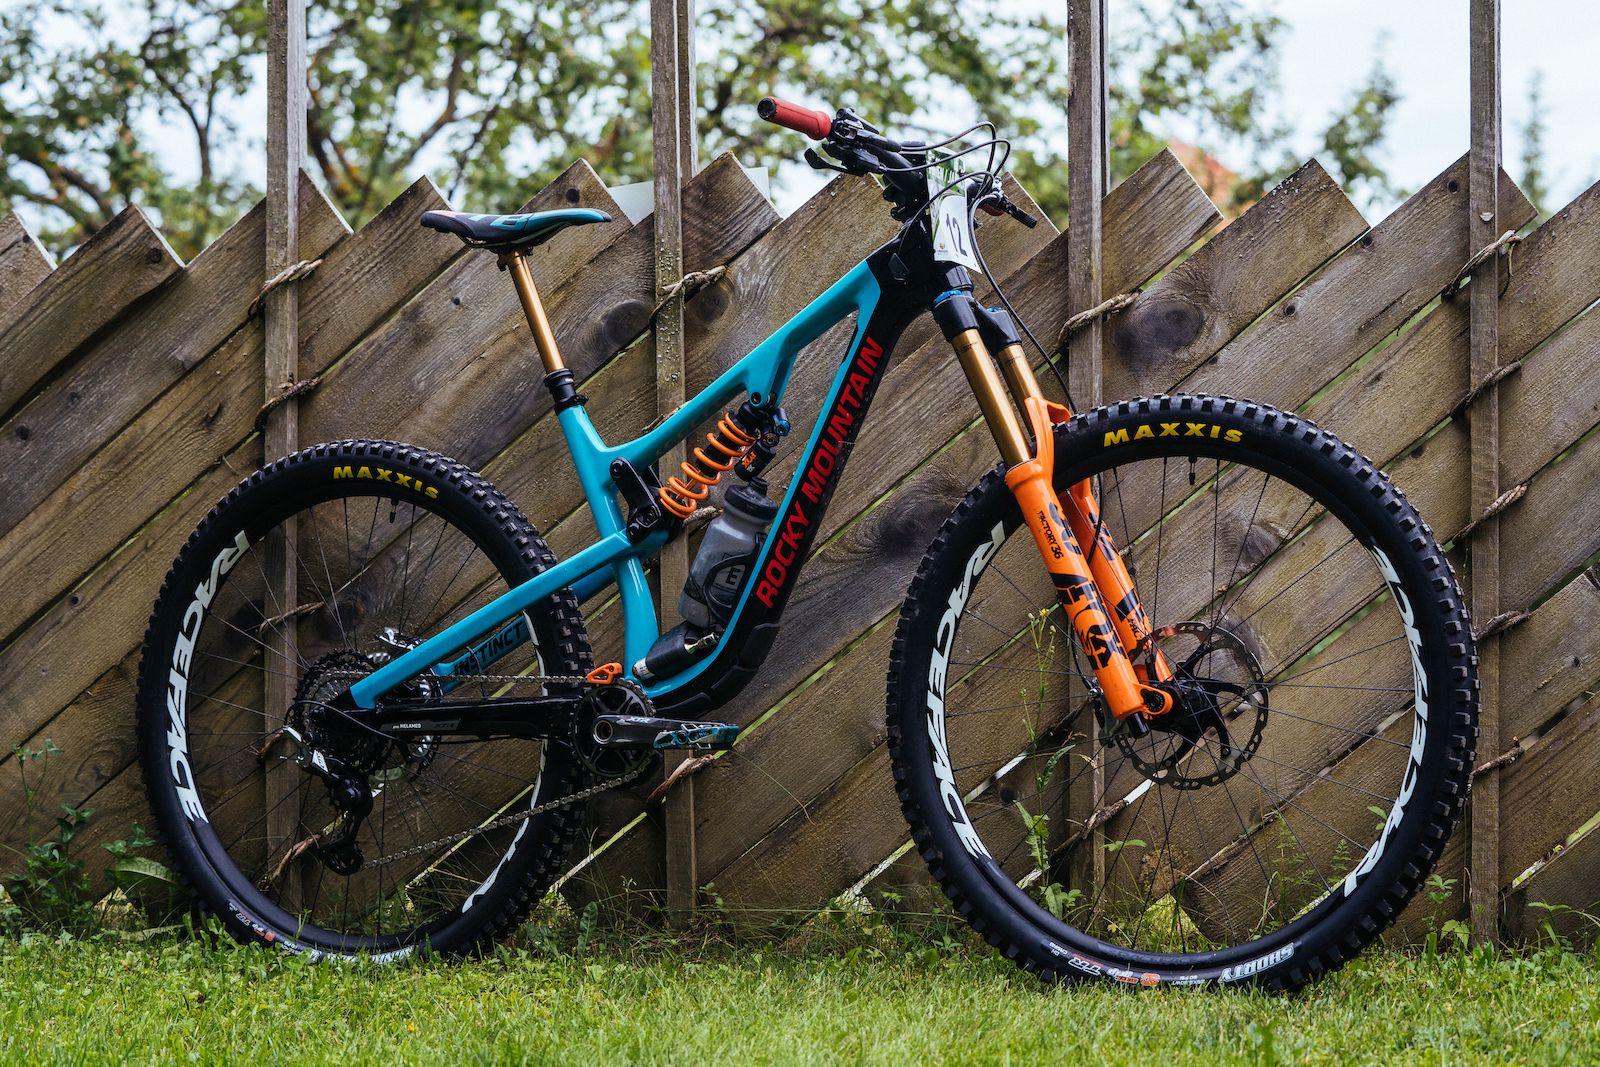 Jesse Melamed Rocky Mountain Instinct Ews 2018 Mountain Bike